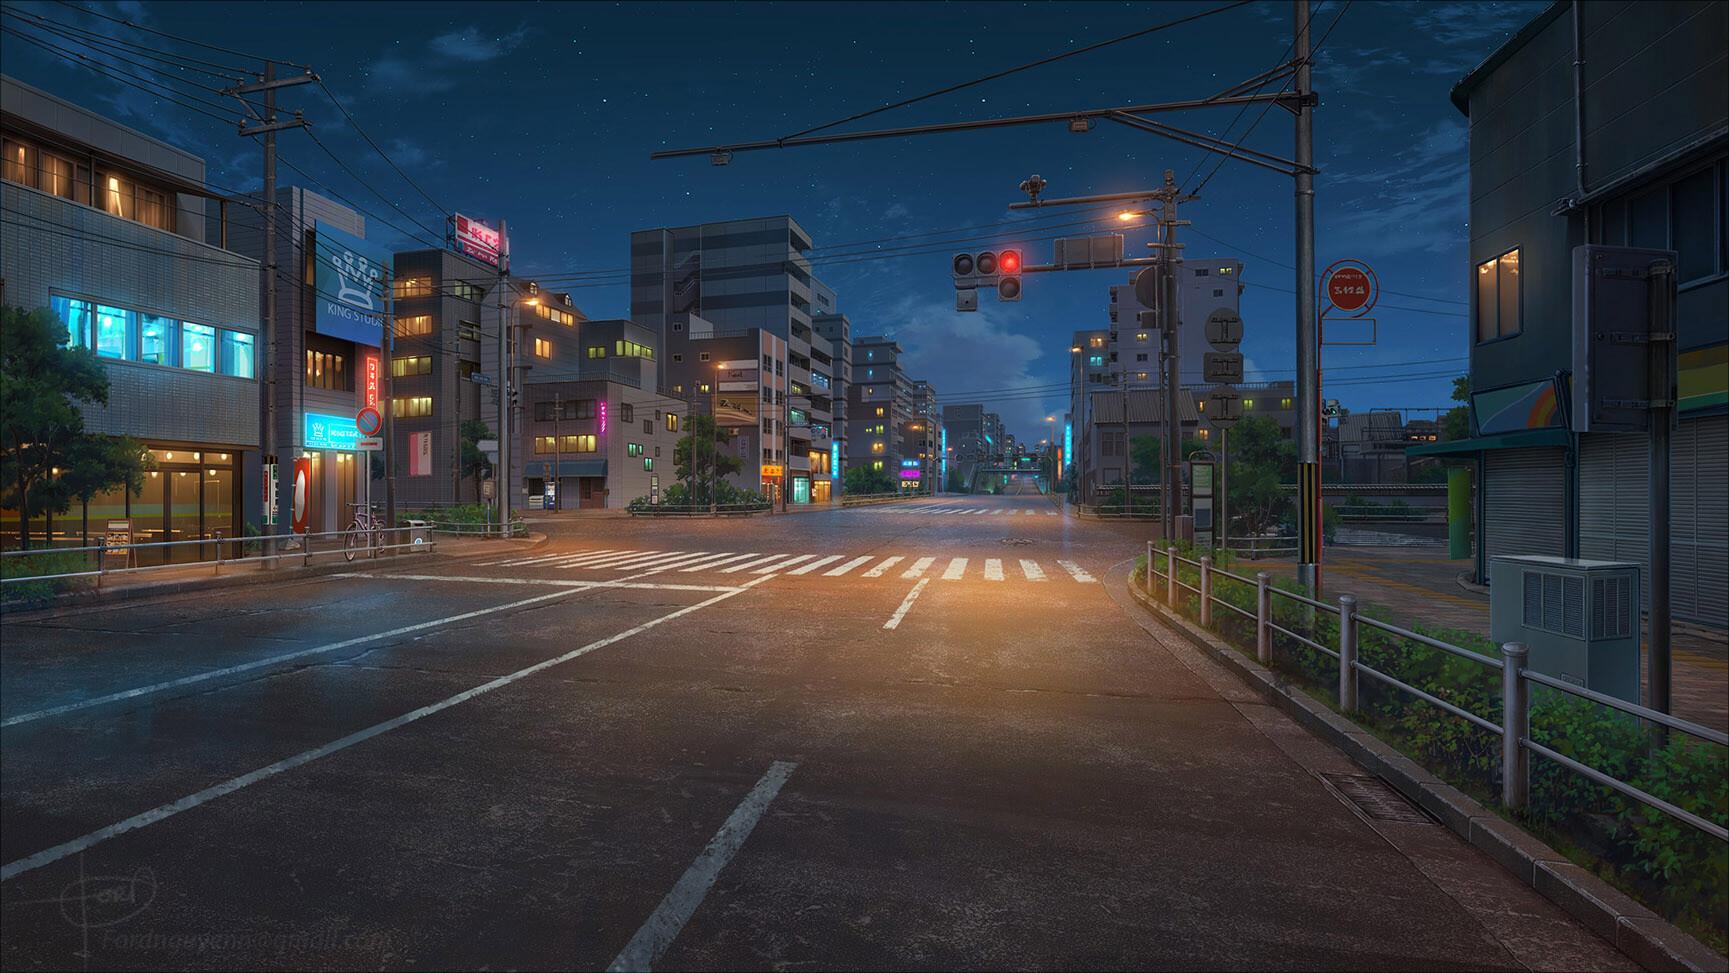 Download 660 Background Art Anime HD Gratis